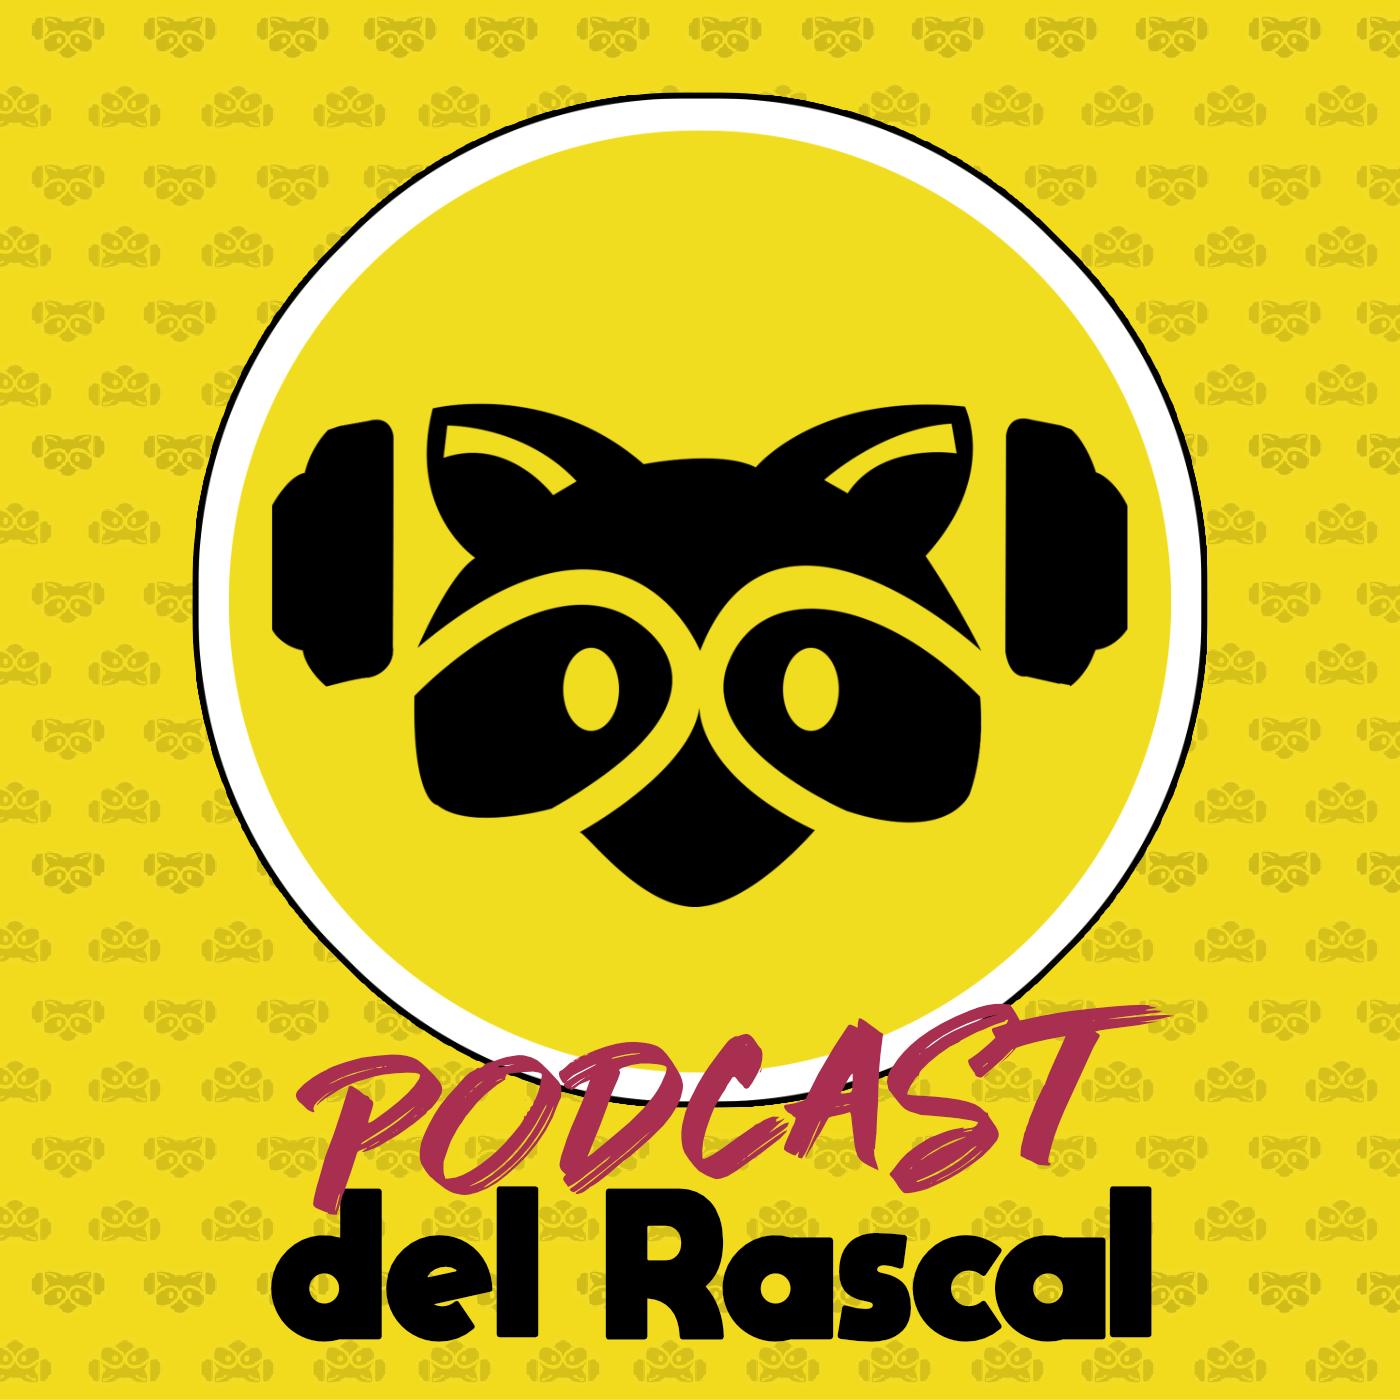 Podcast del Rascal